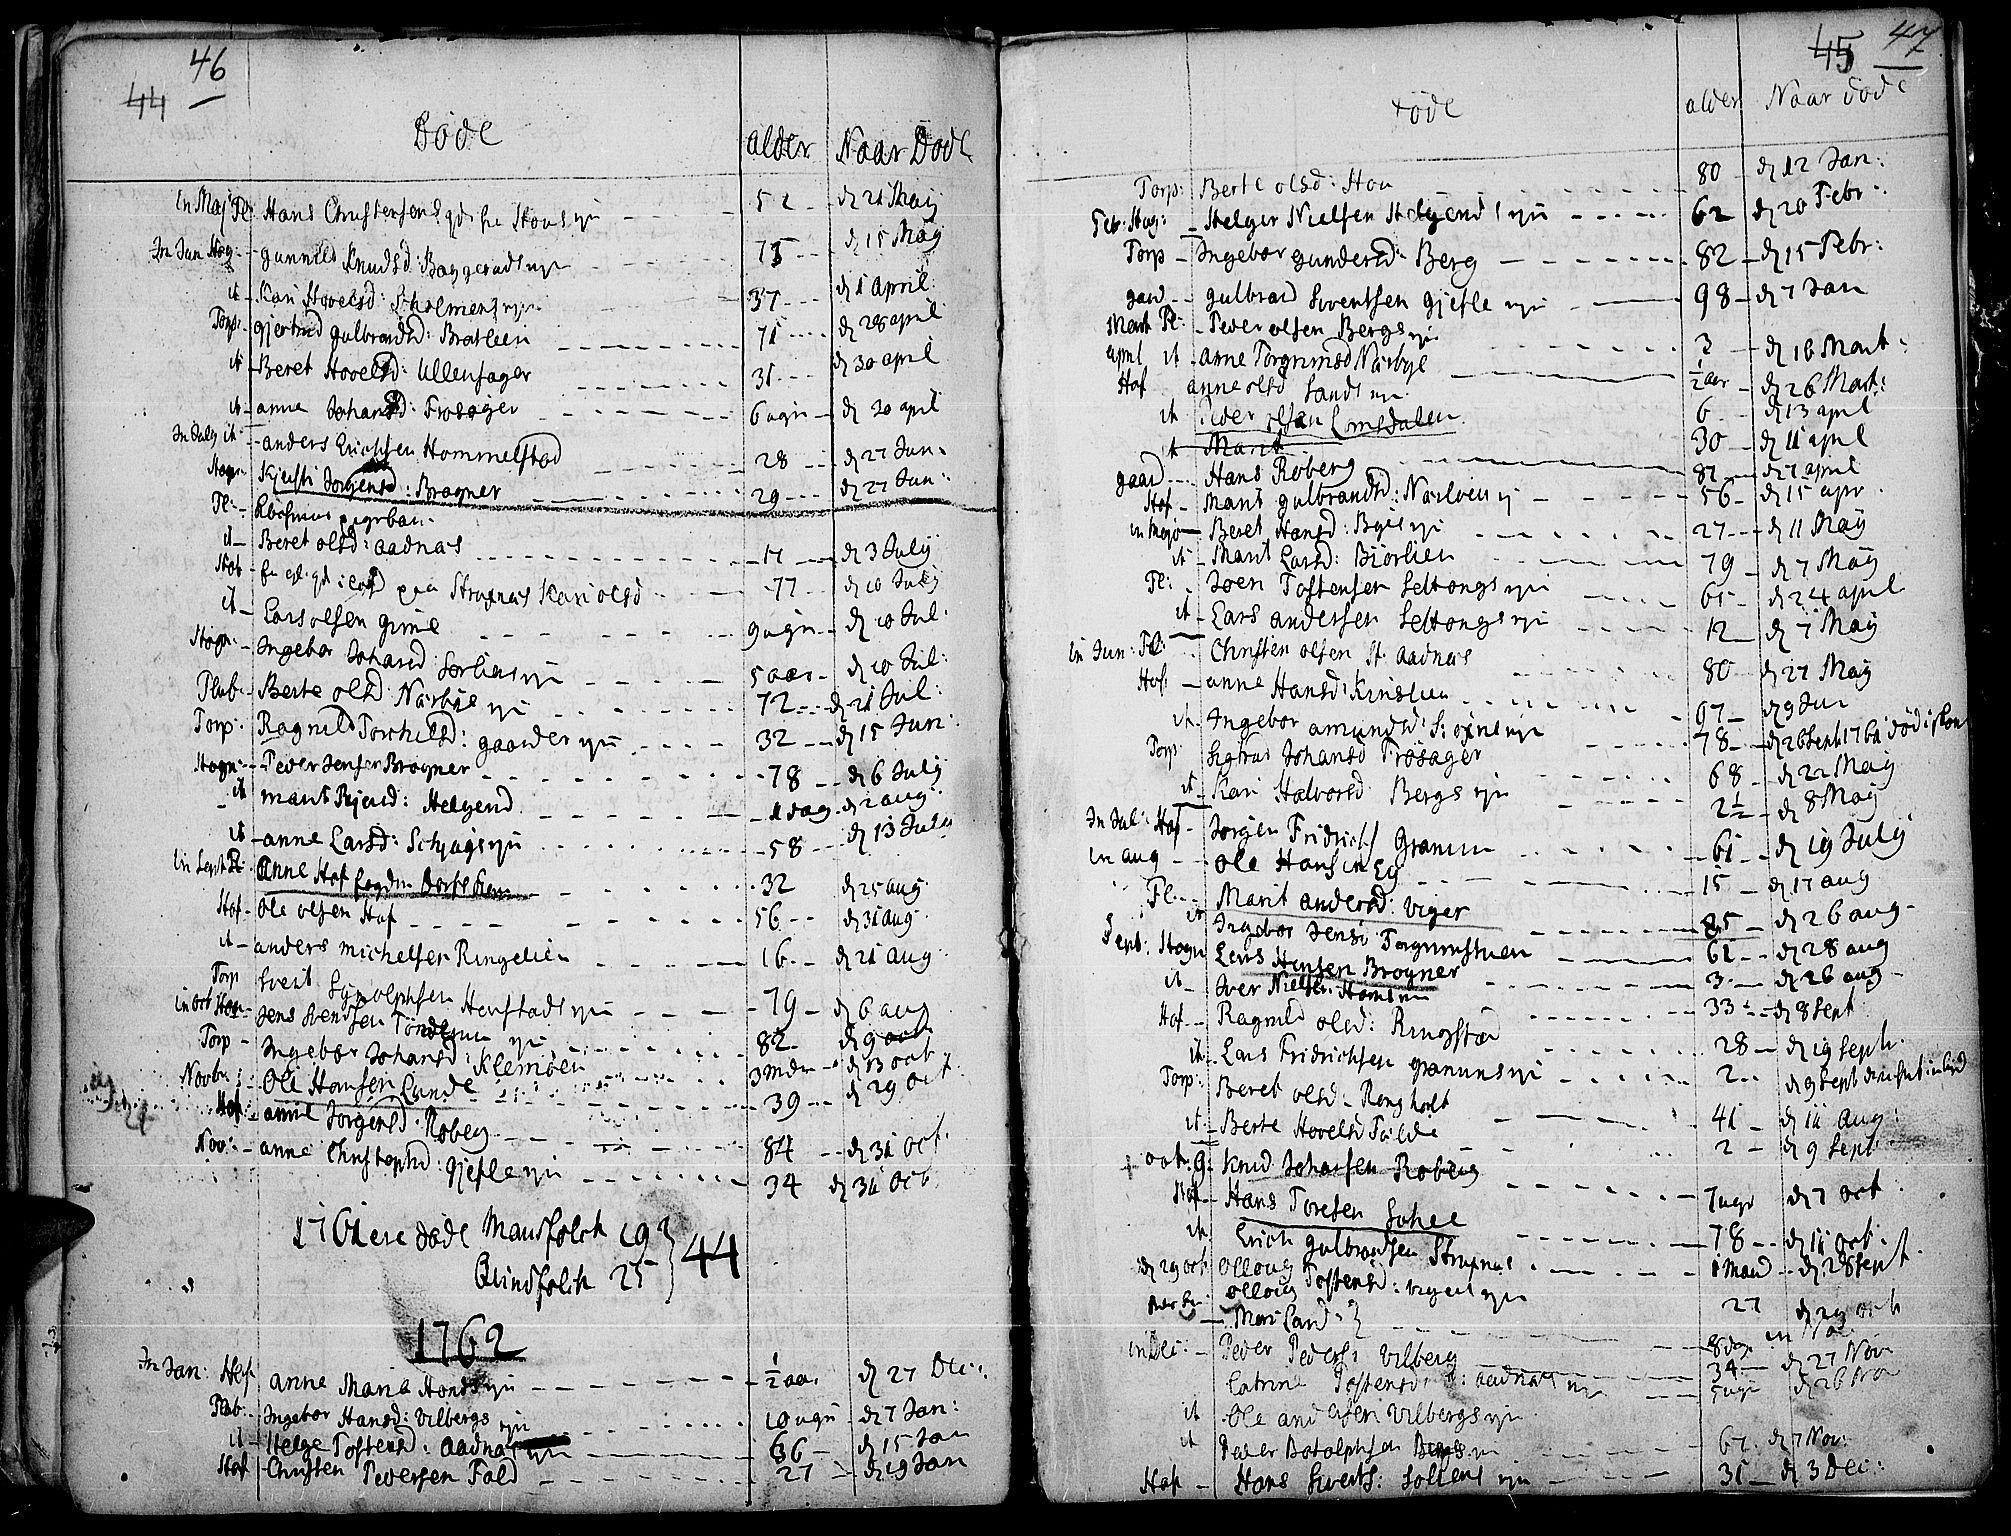 SAH, Land prestekontor, Ministerialbok nr. 4, 1733-1764, s. 46-47